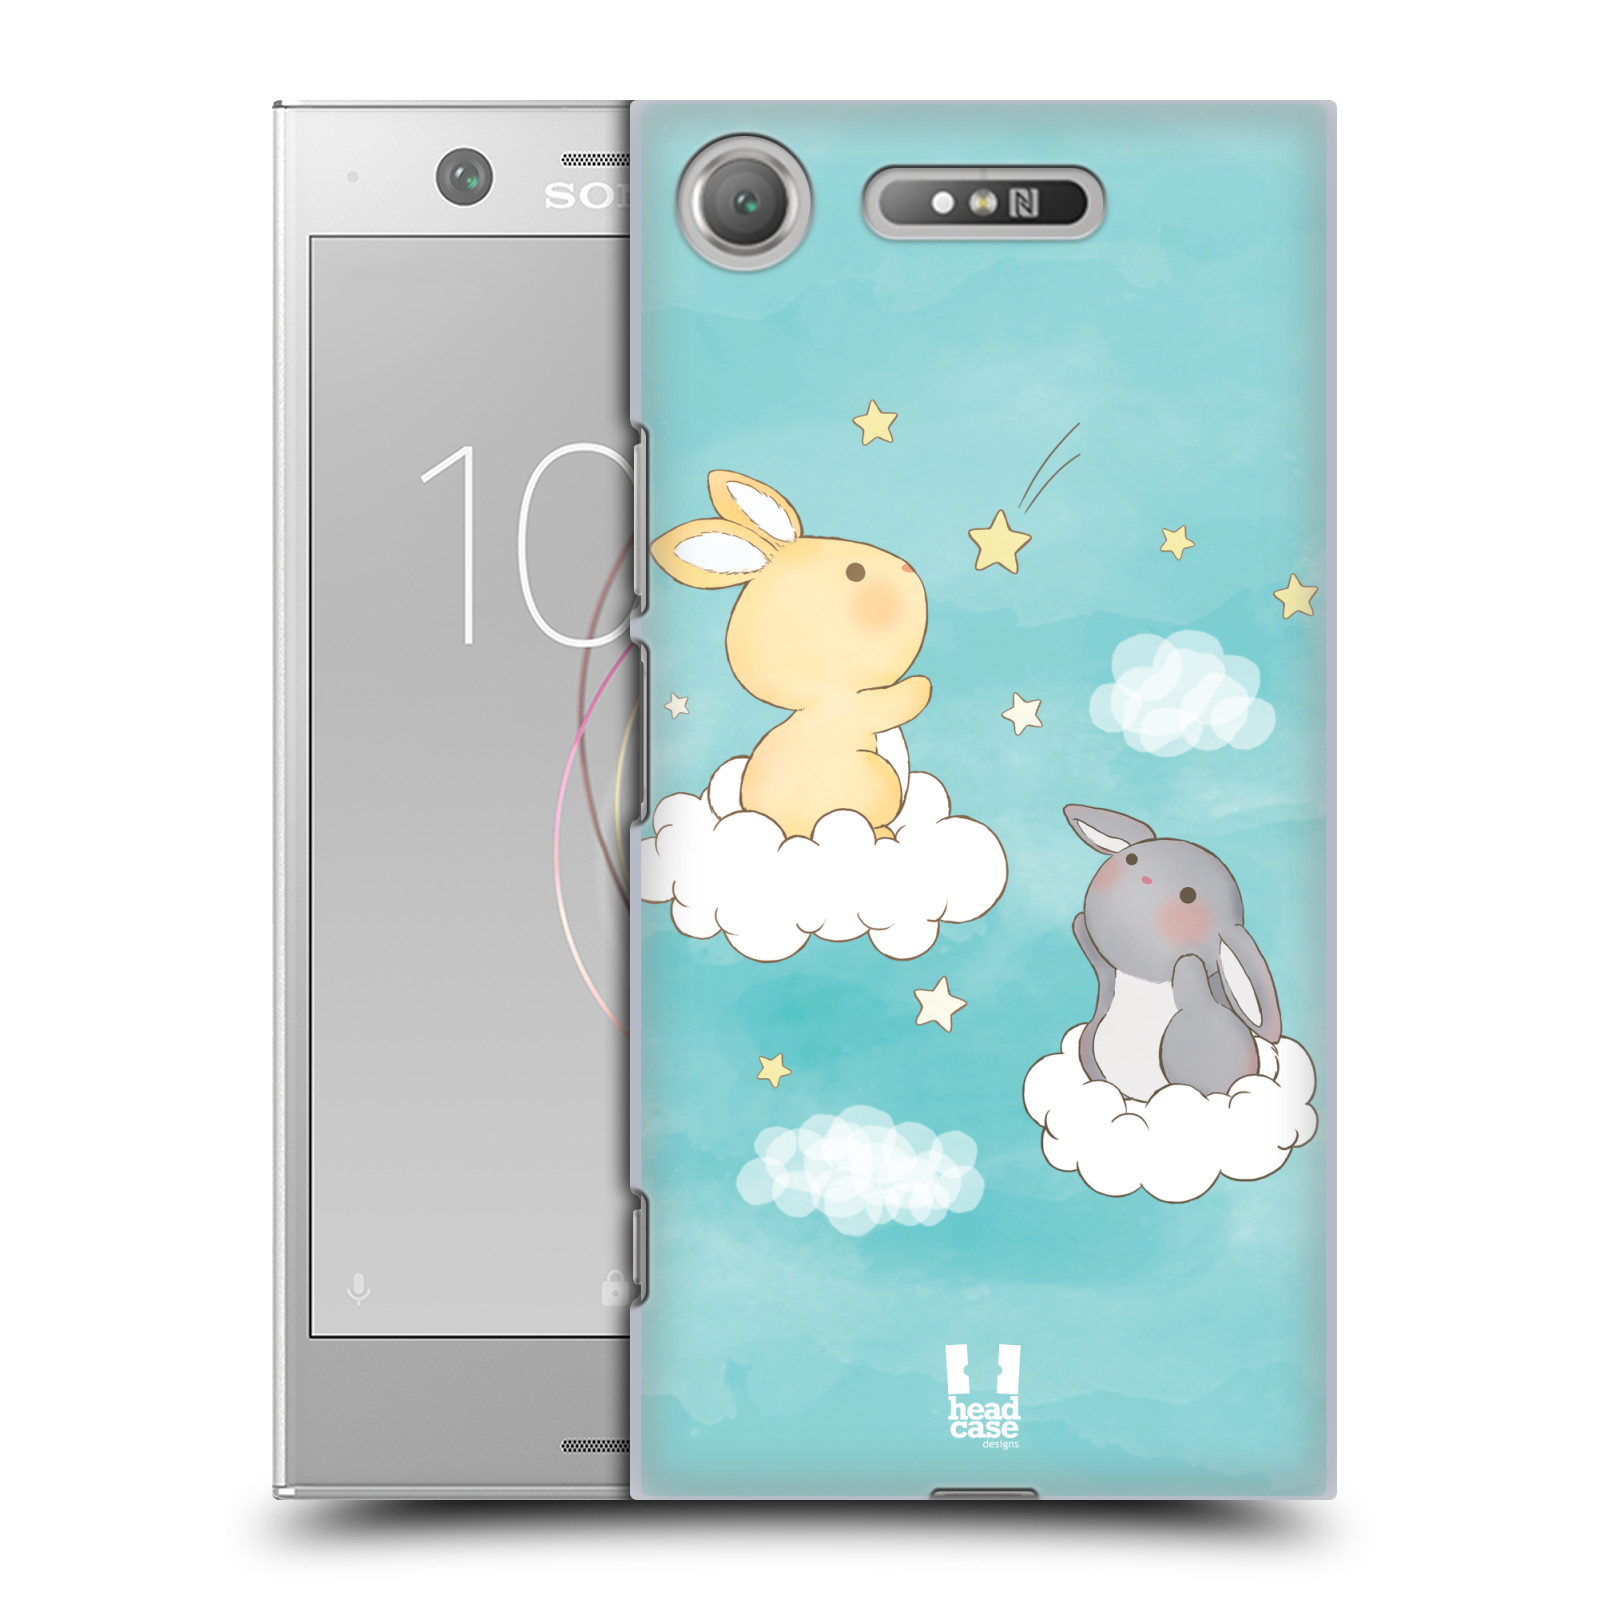 HEAD CASE plastový obal na mobil Sony Xperia XZ1 vzor králíček a hvězdy modrá